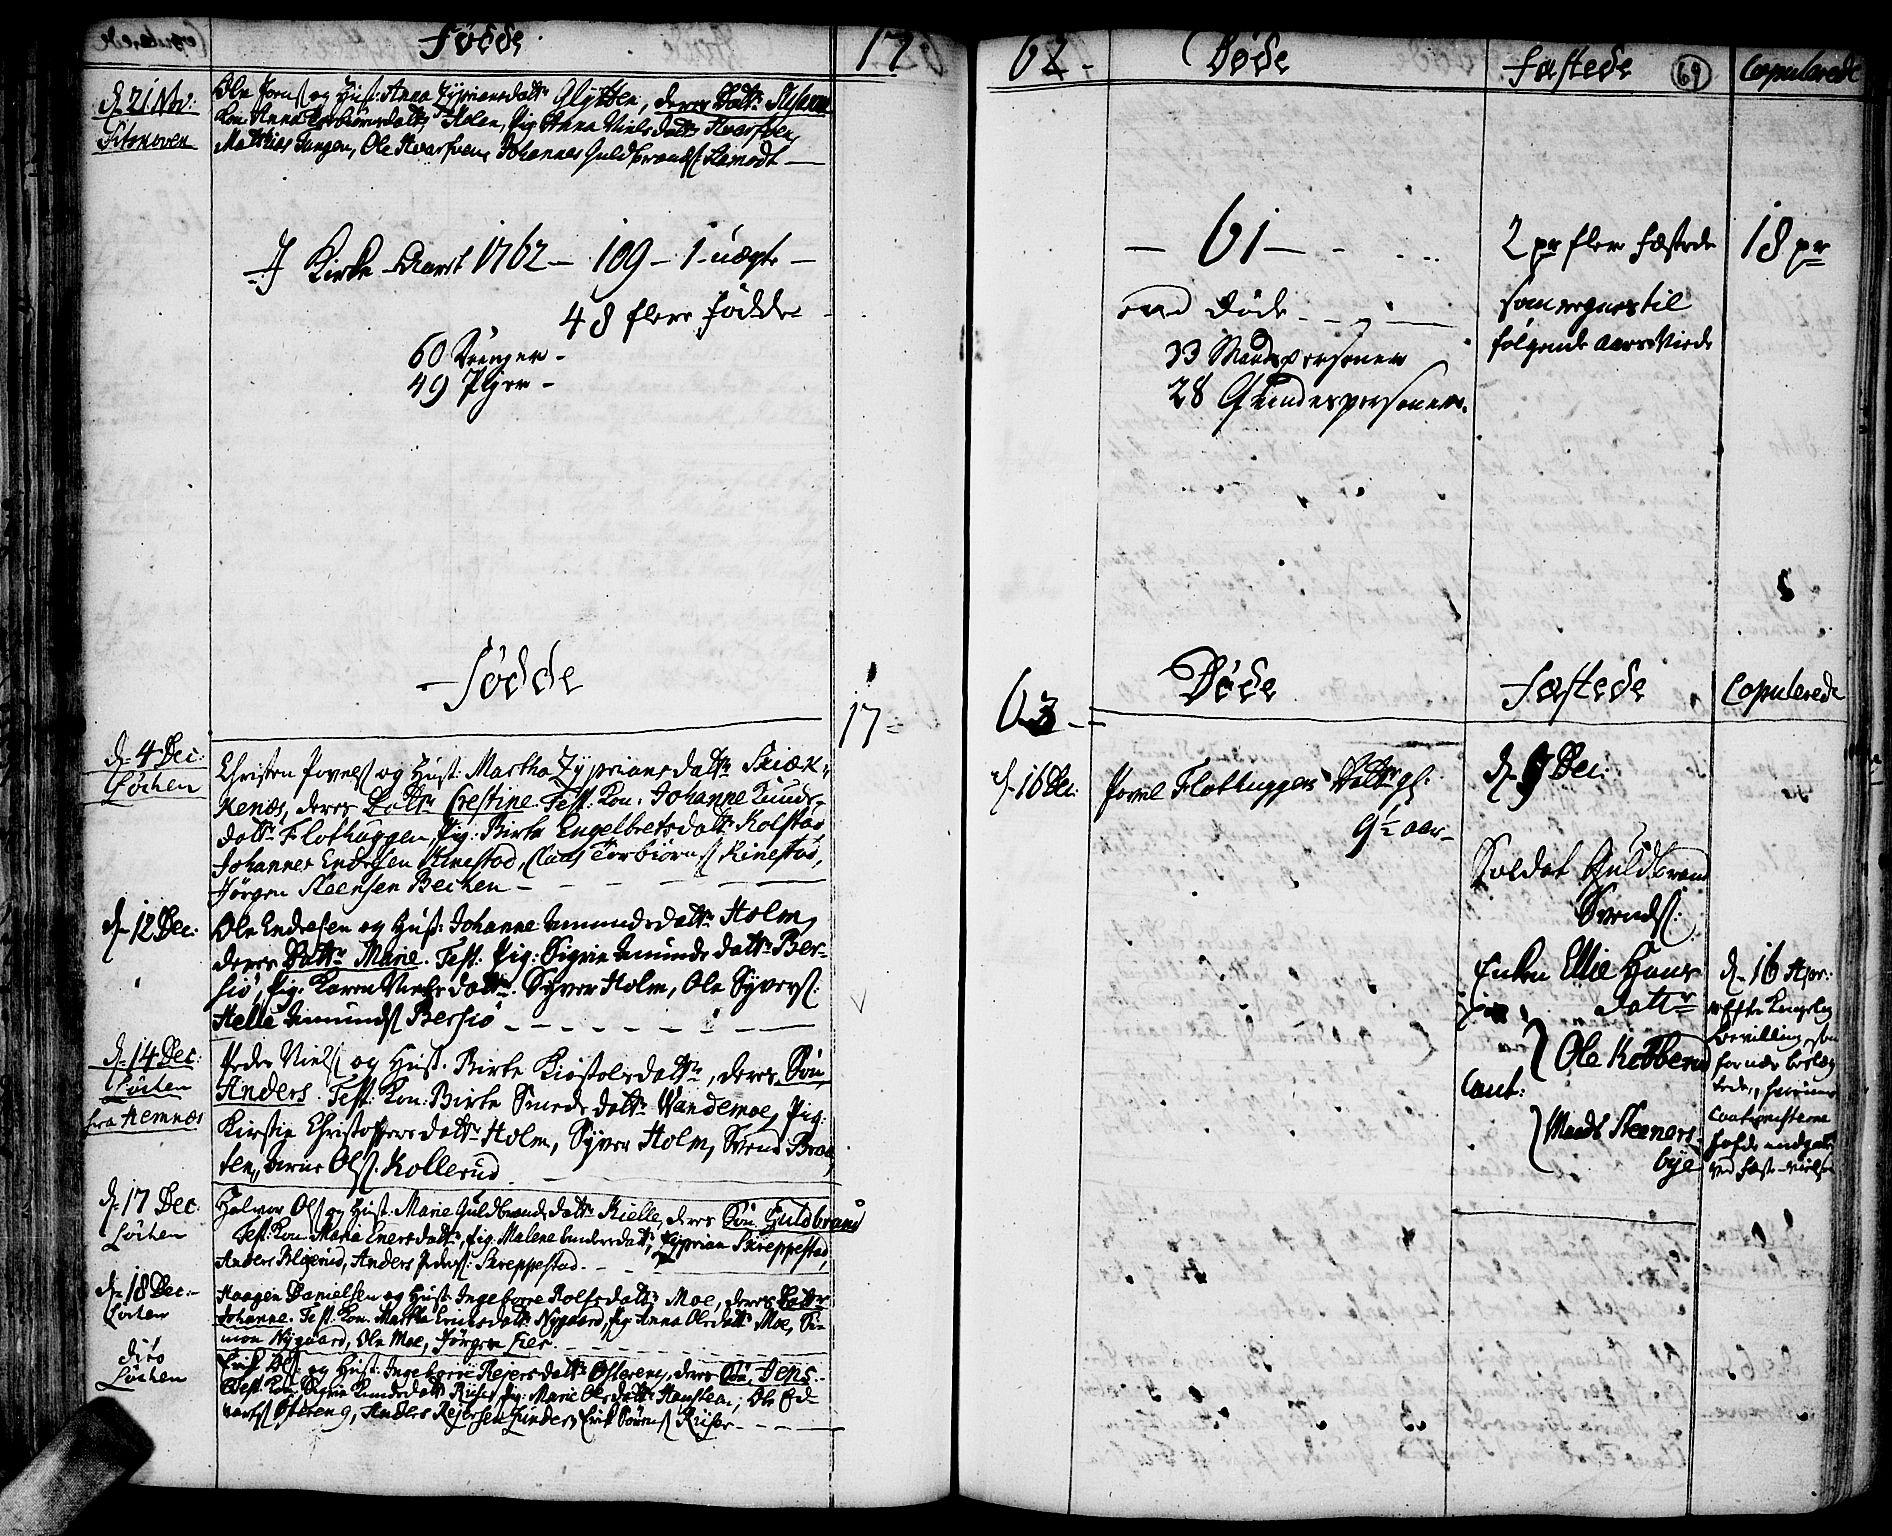 SAO, Høland prestekontor Kirkebøker, F/Fa/L0004: Ministerialbok nr. I 4, 1757-1780, s. 69